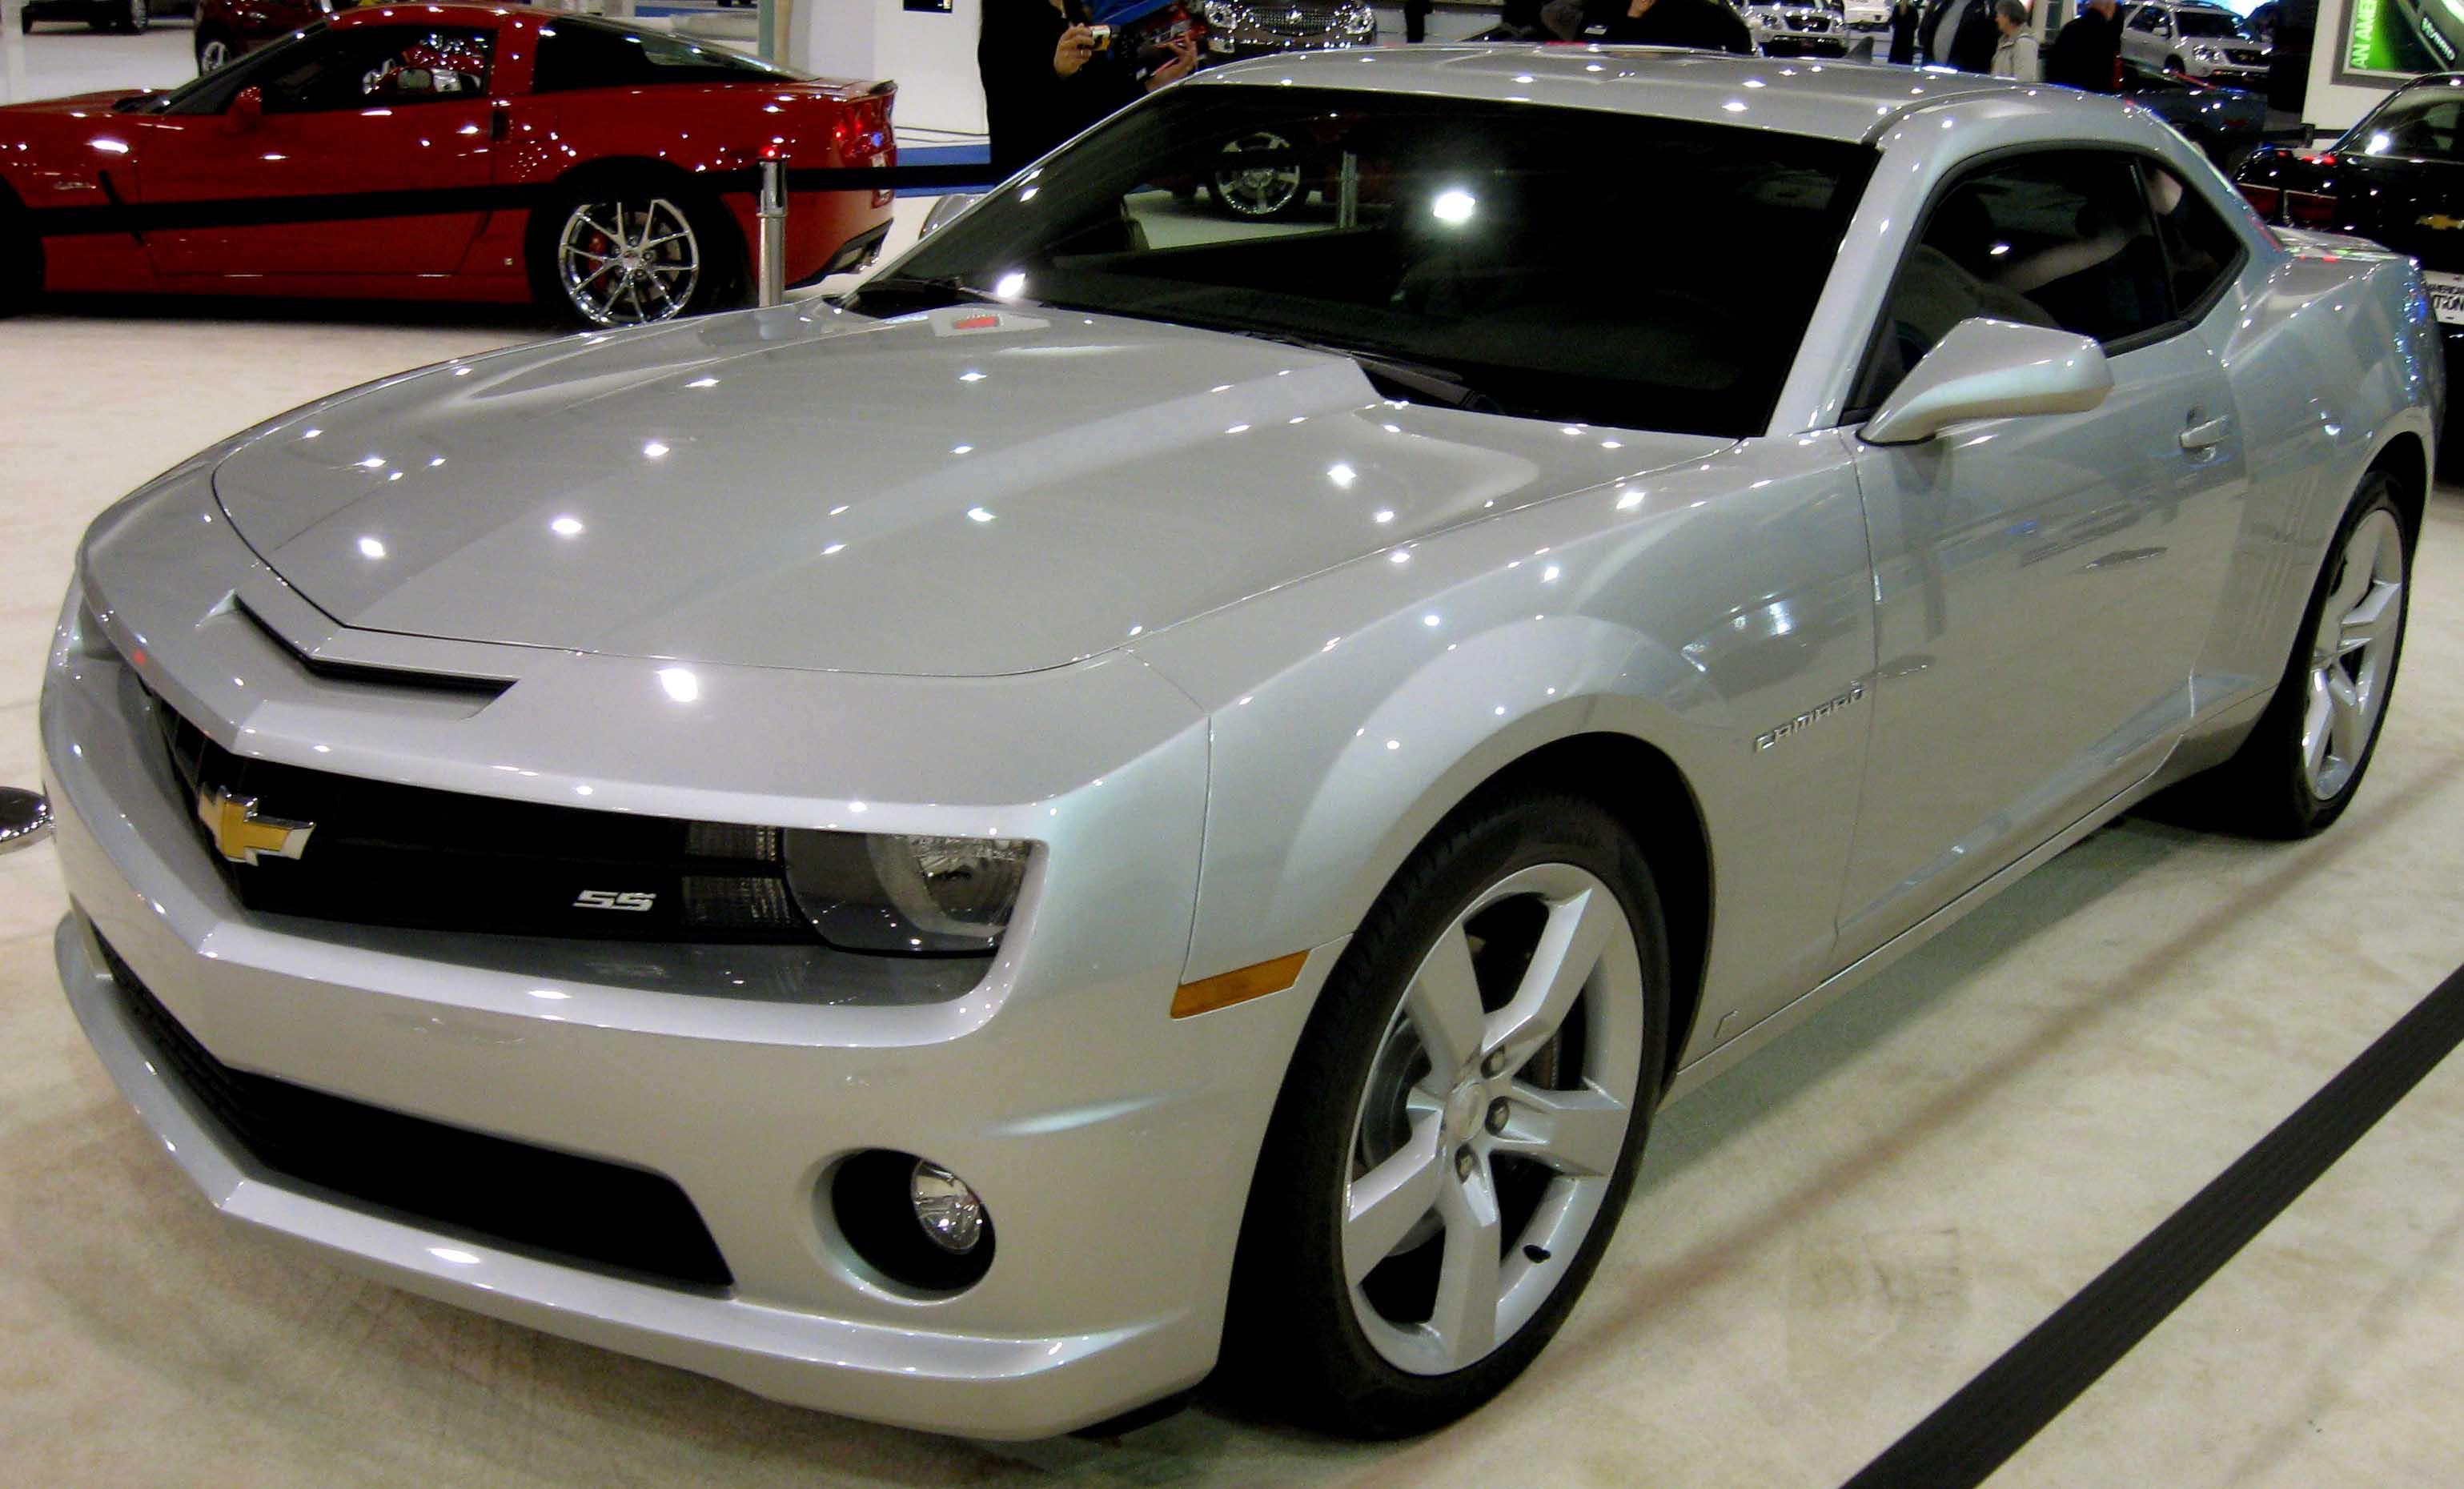 File:2010 Chevrolet Camaro SS DC